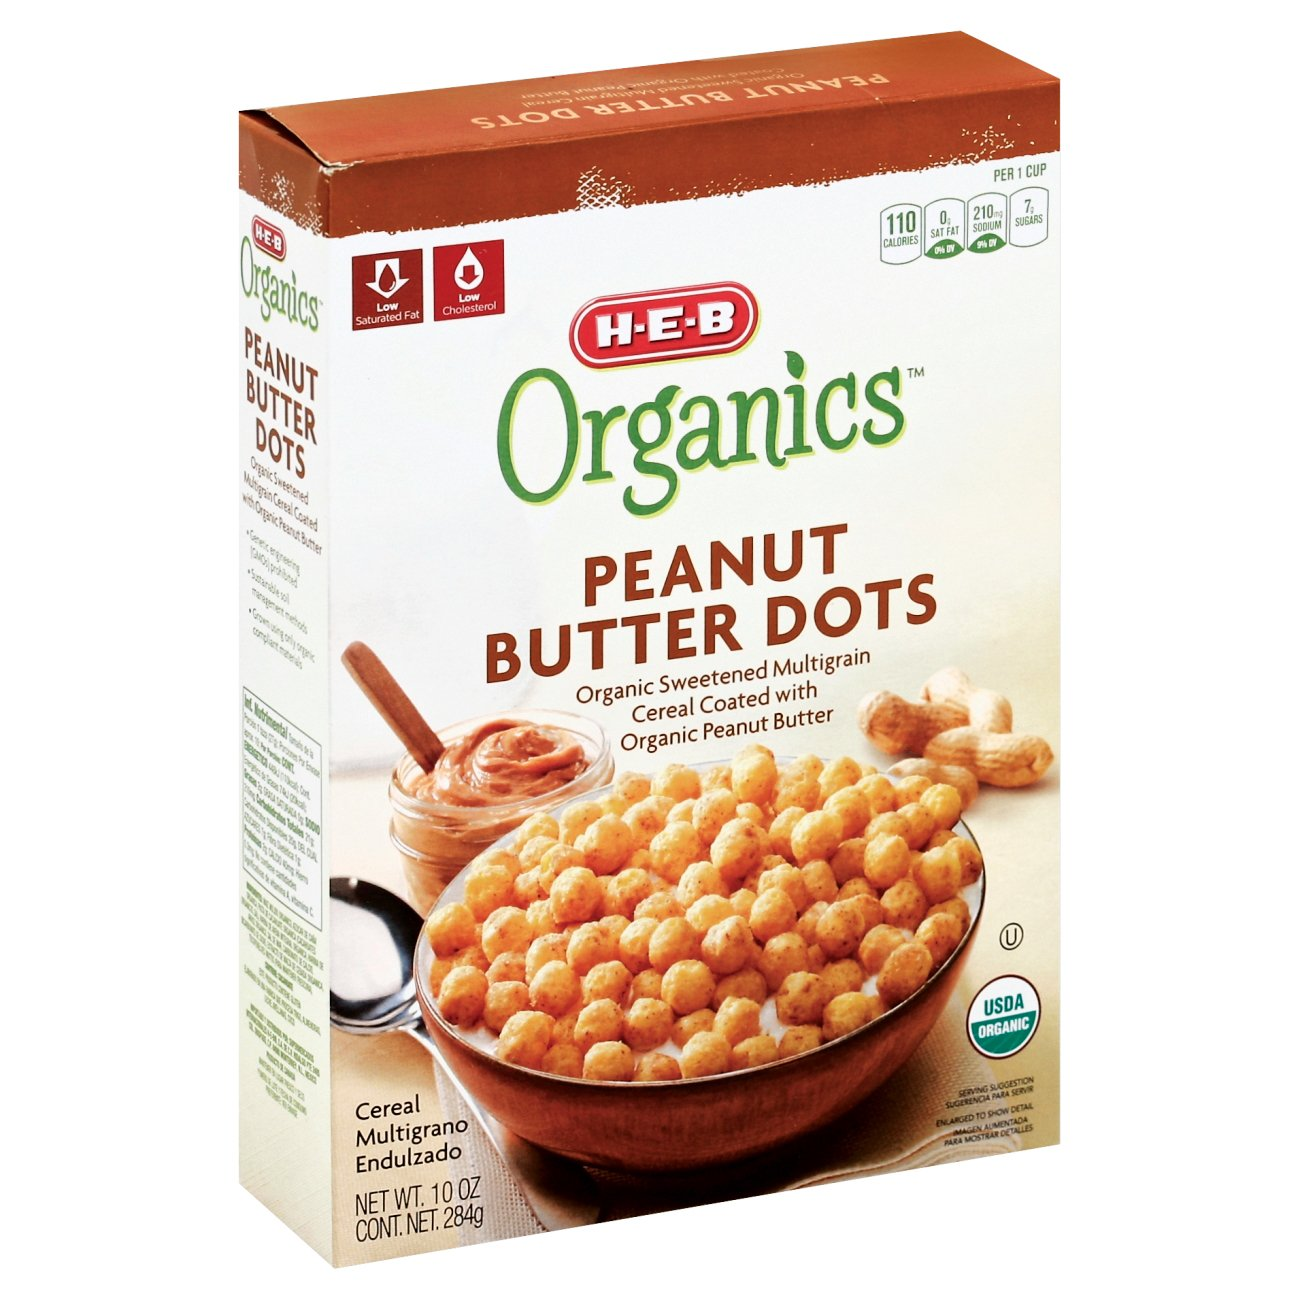 H-E-B Organics Peanut Butter Dots Cereal